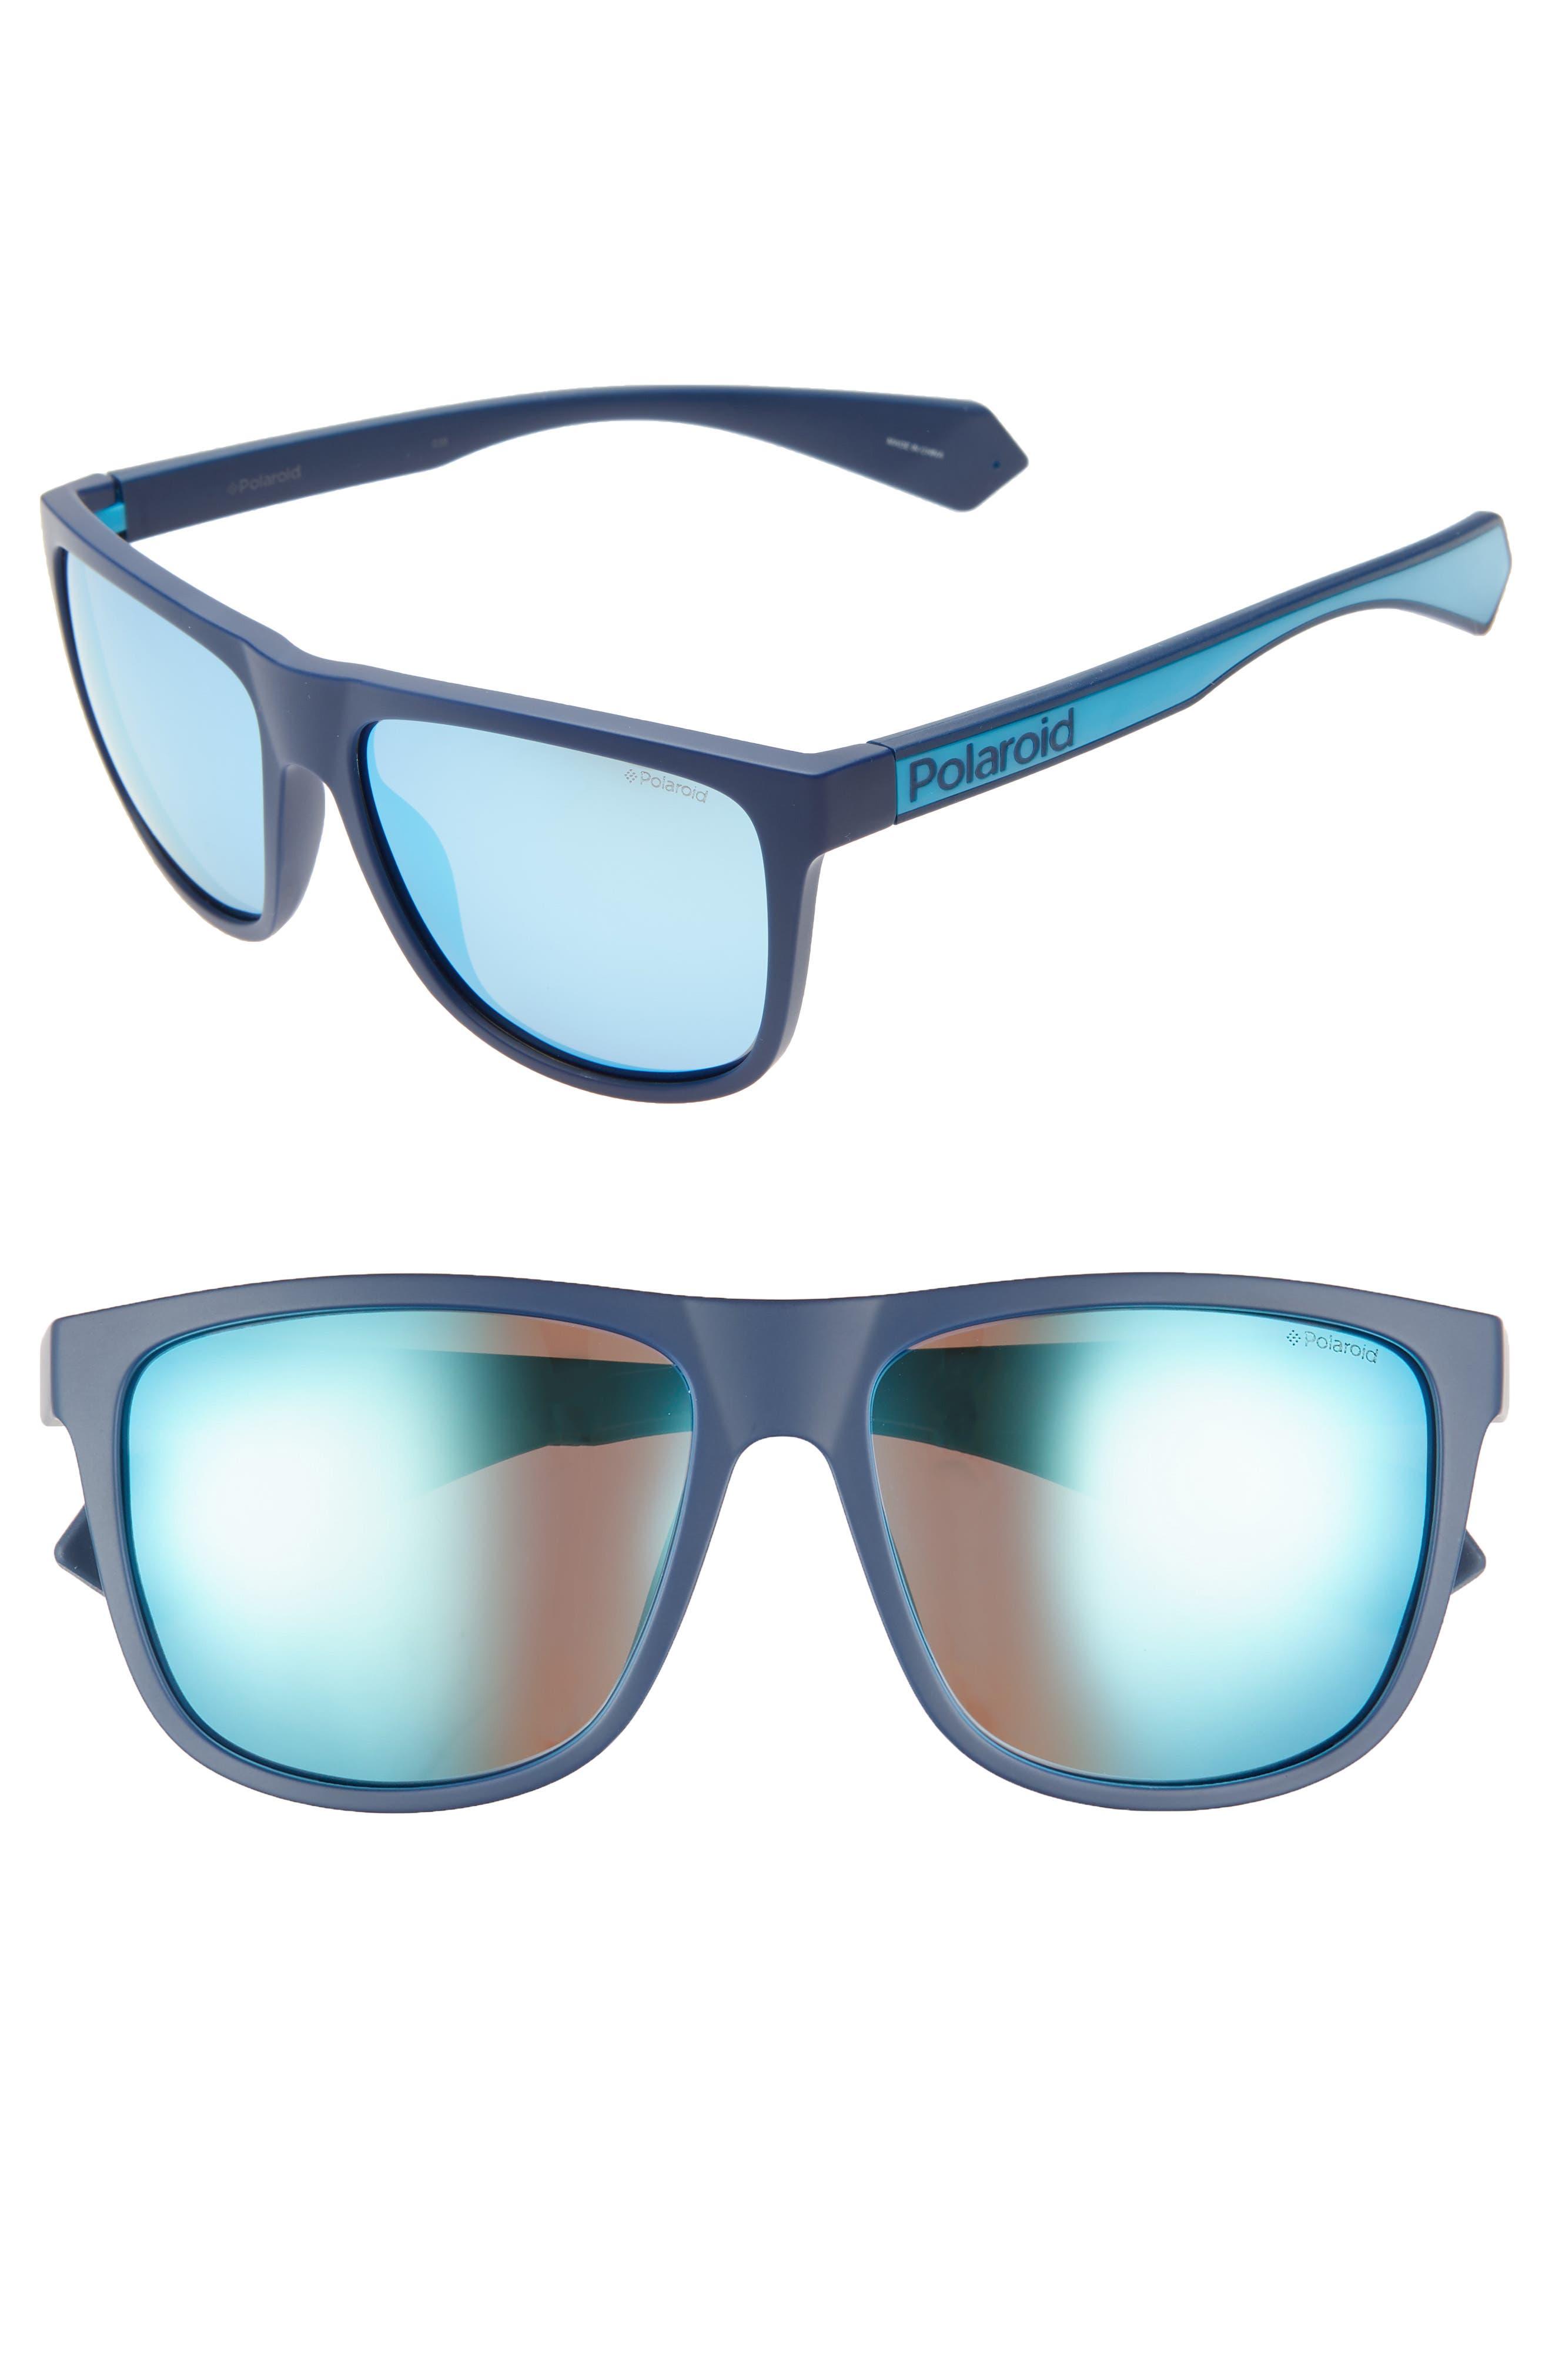 Plastic Core 57mm Polarized Sunglasses,                         Main,                         color, BLUE